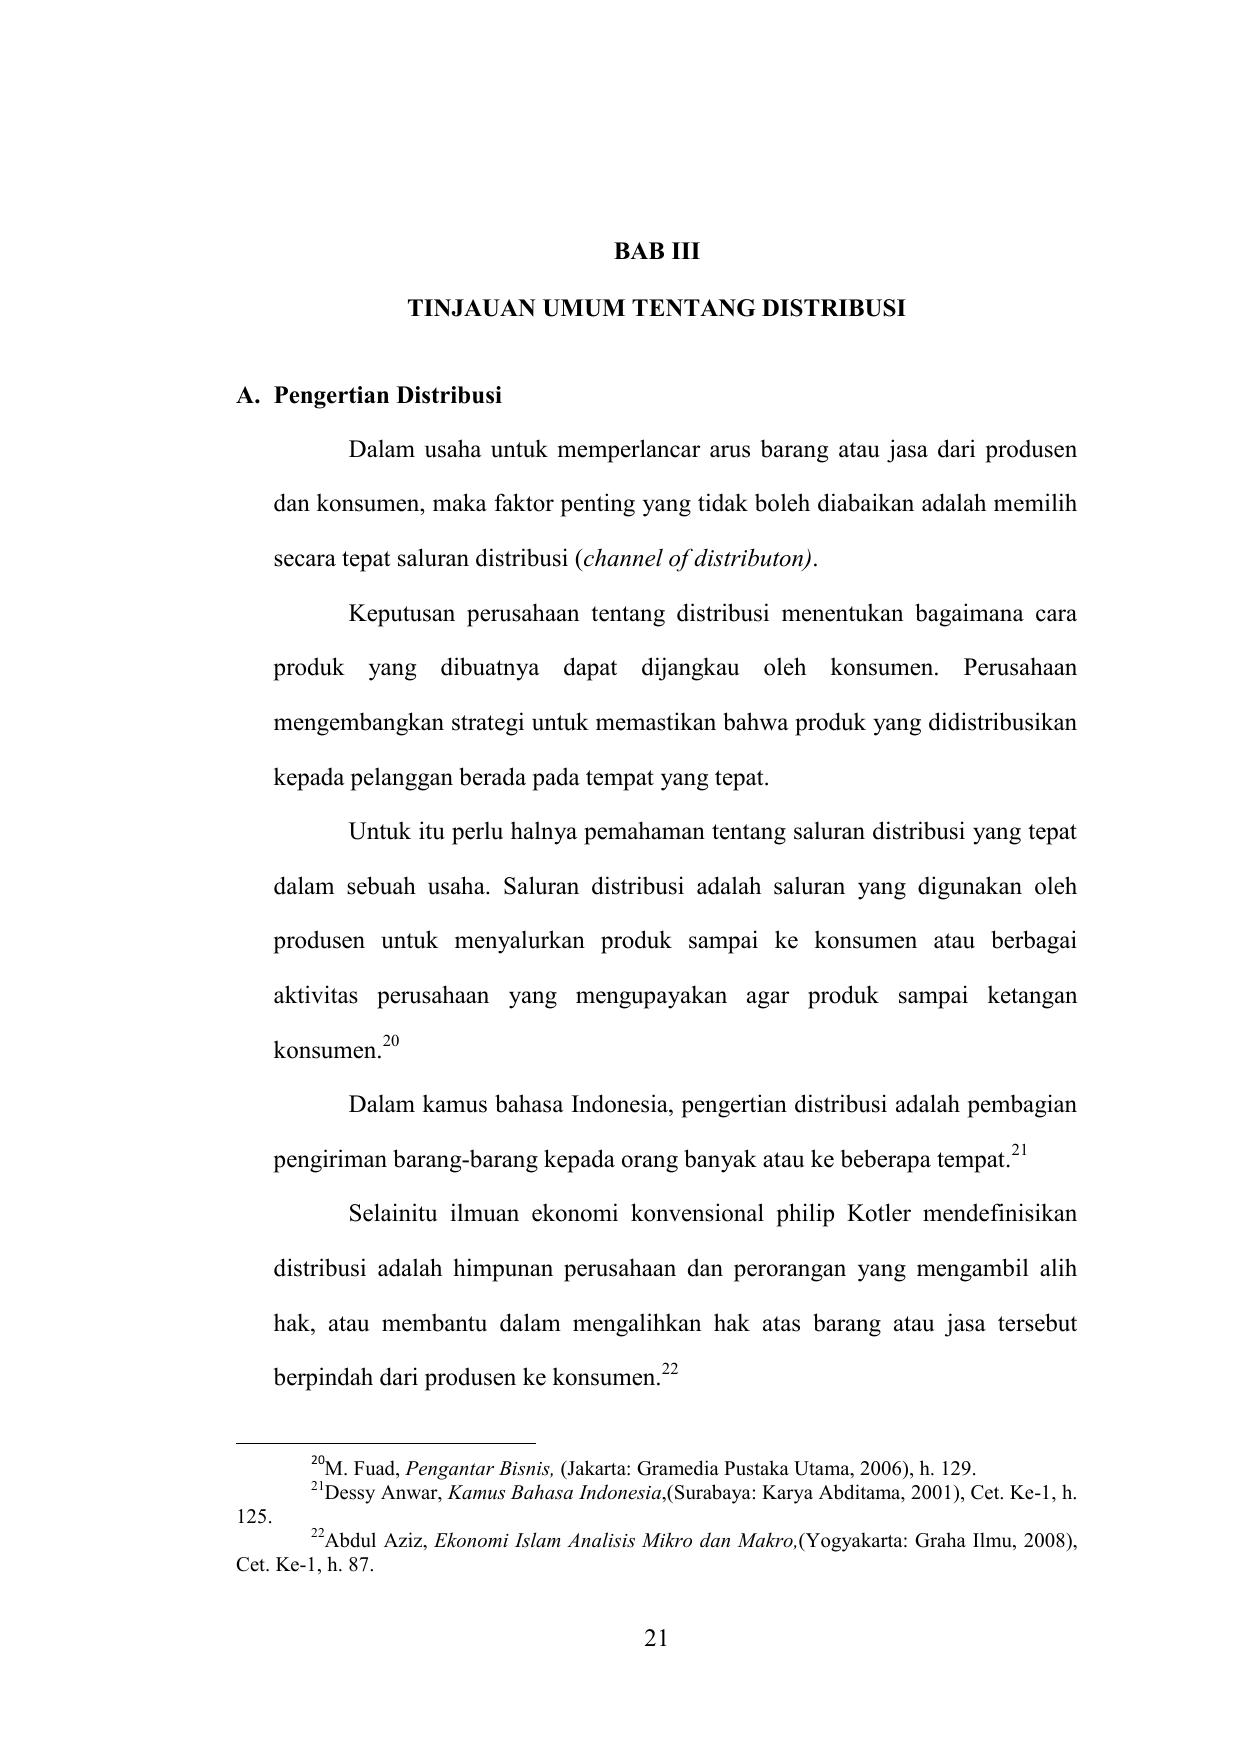 Ekonomi Islam Analisis Mikro Makro Abdul Aziz Graha Ilmu Daftar Spray Rossy 21